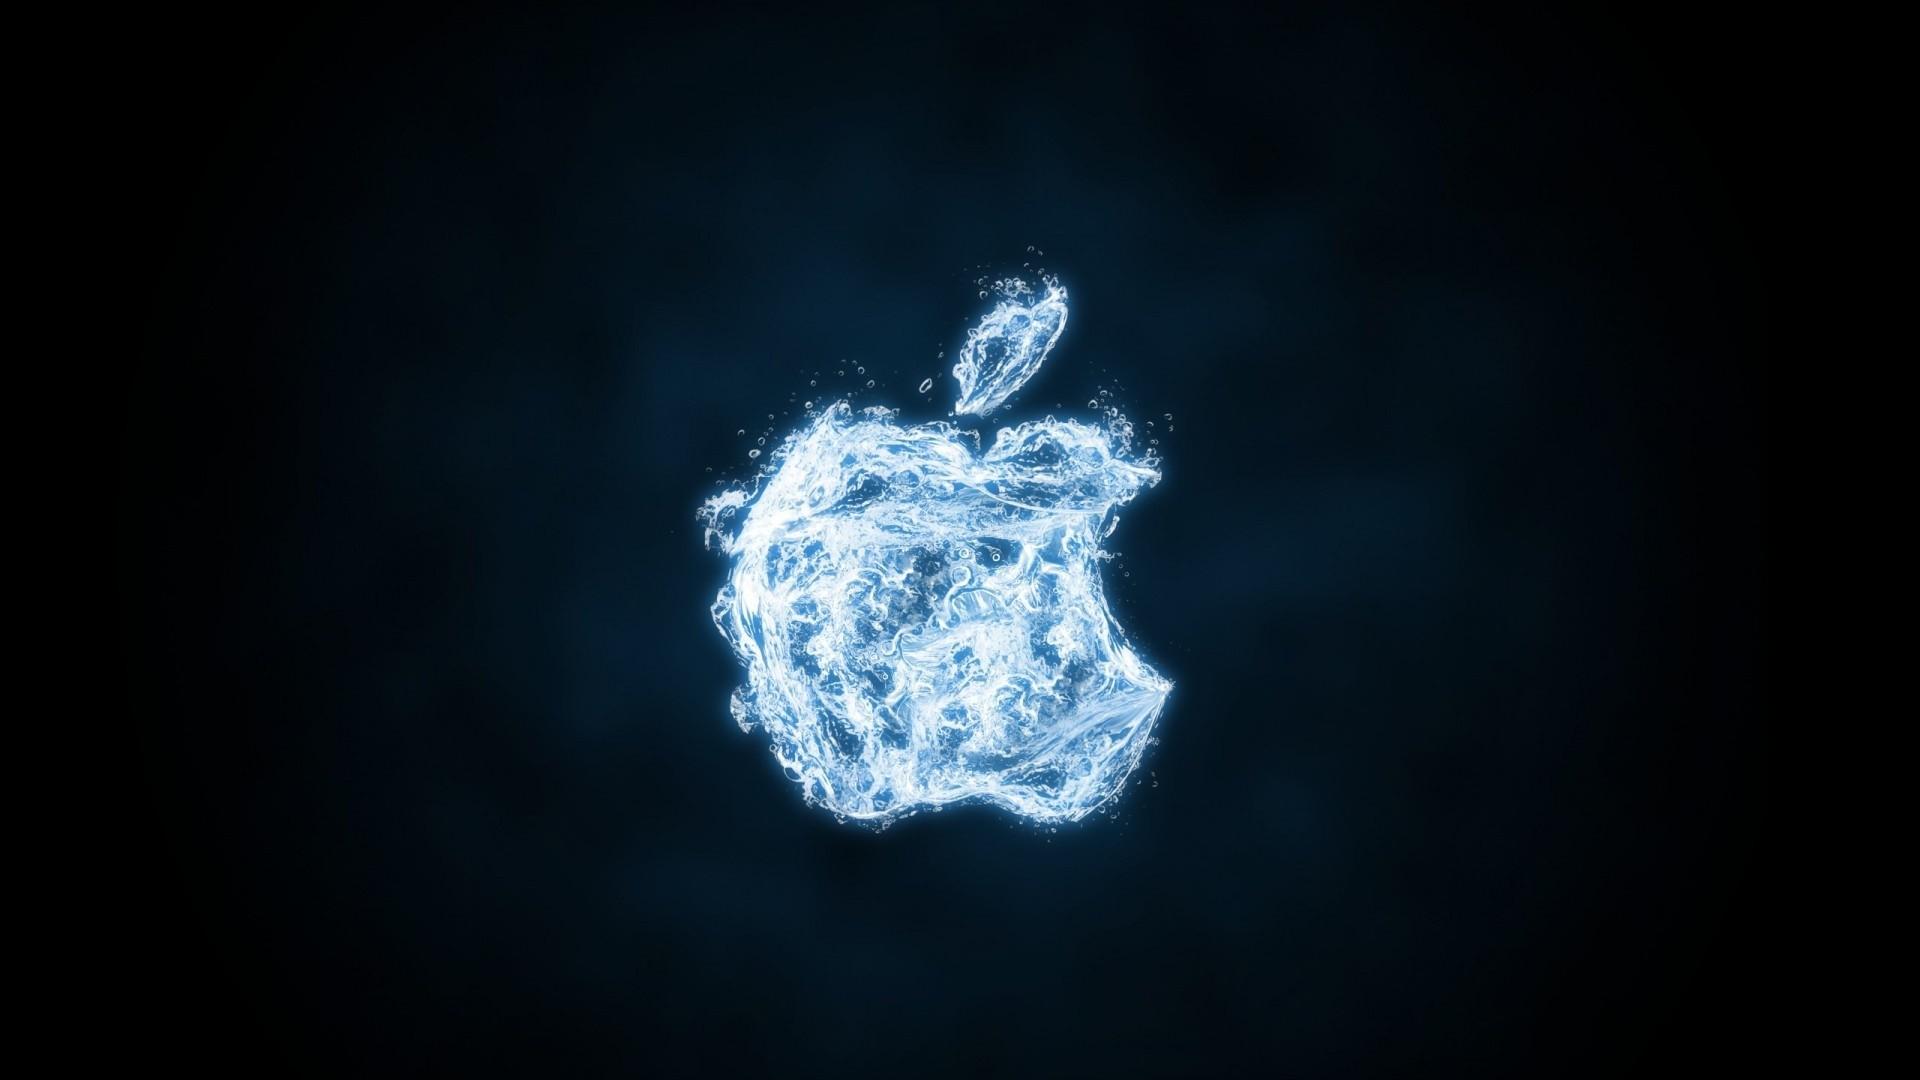 Water Apple Computer Logo Wallpaper